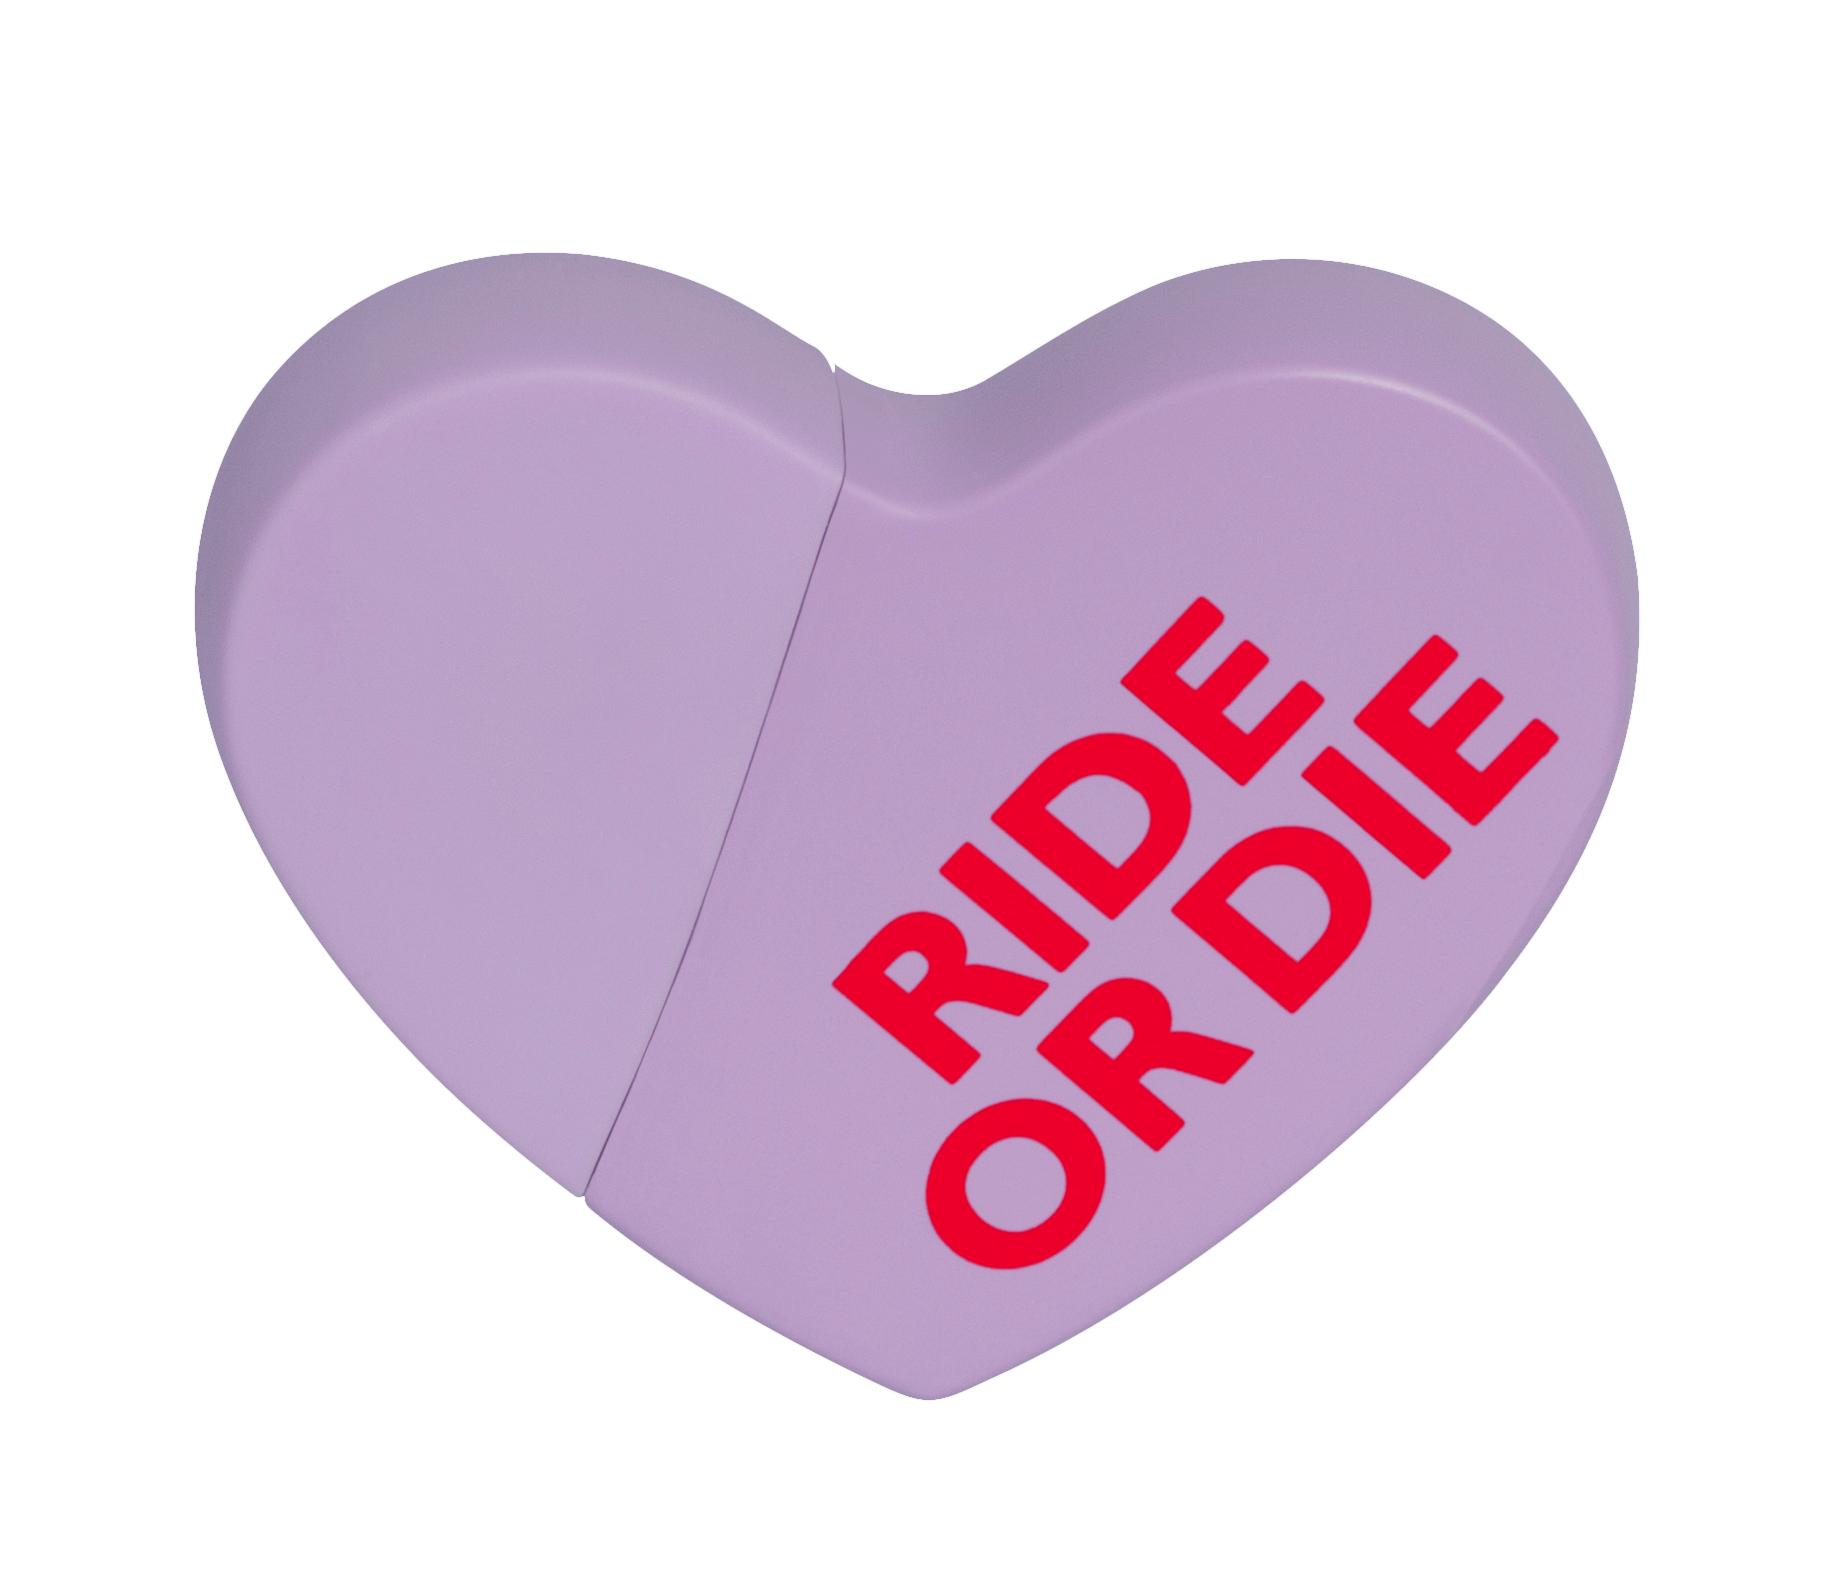 KKW Beauty Kimoji Heart Ride Ordie Fragrances